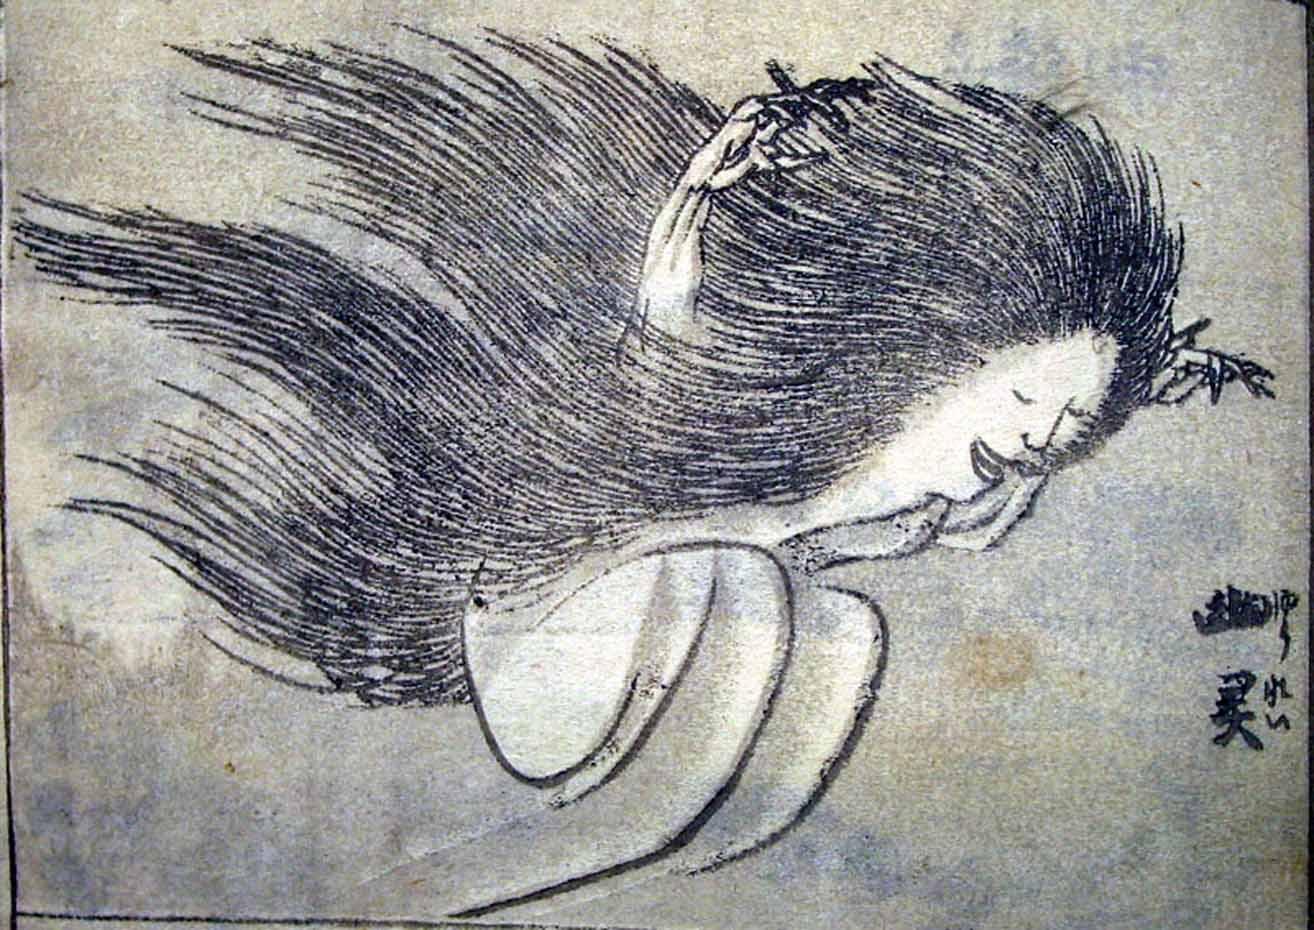 Кацусика Хокусай (Katsushika Hokusai), Yurei